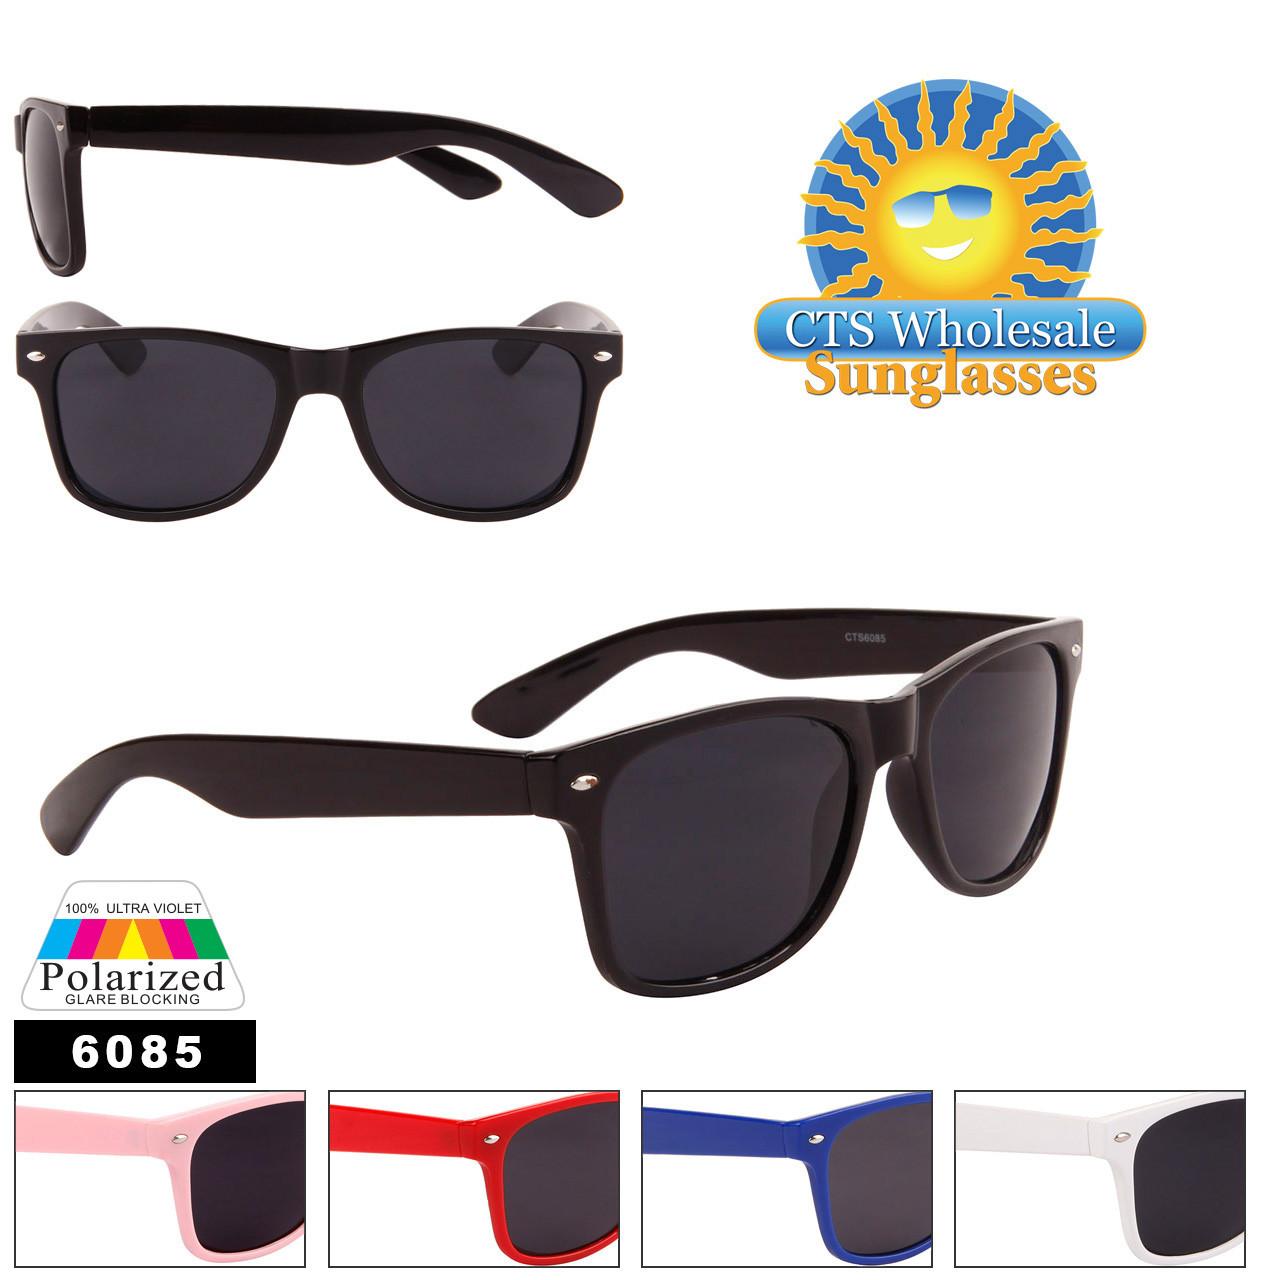 edfd9688ee1 Wholesale Polarized California Classics Style -  6085